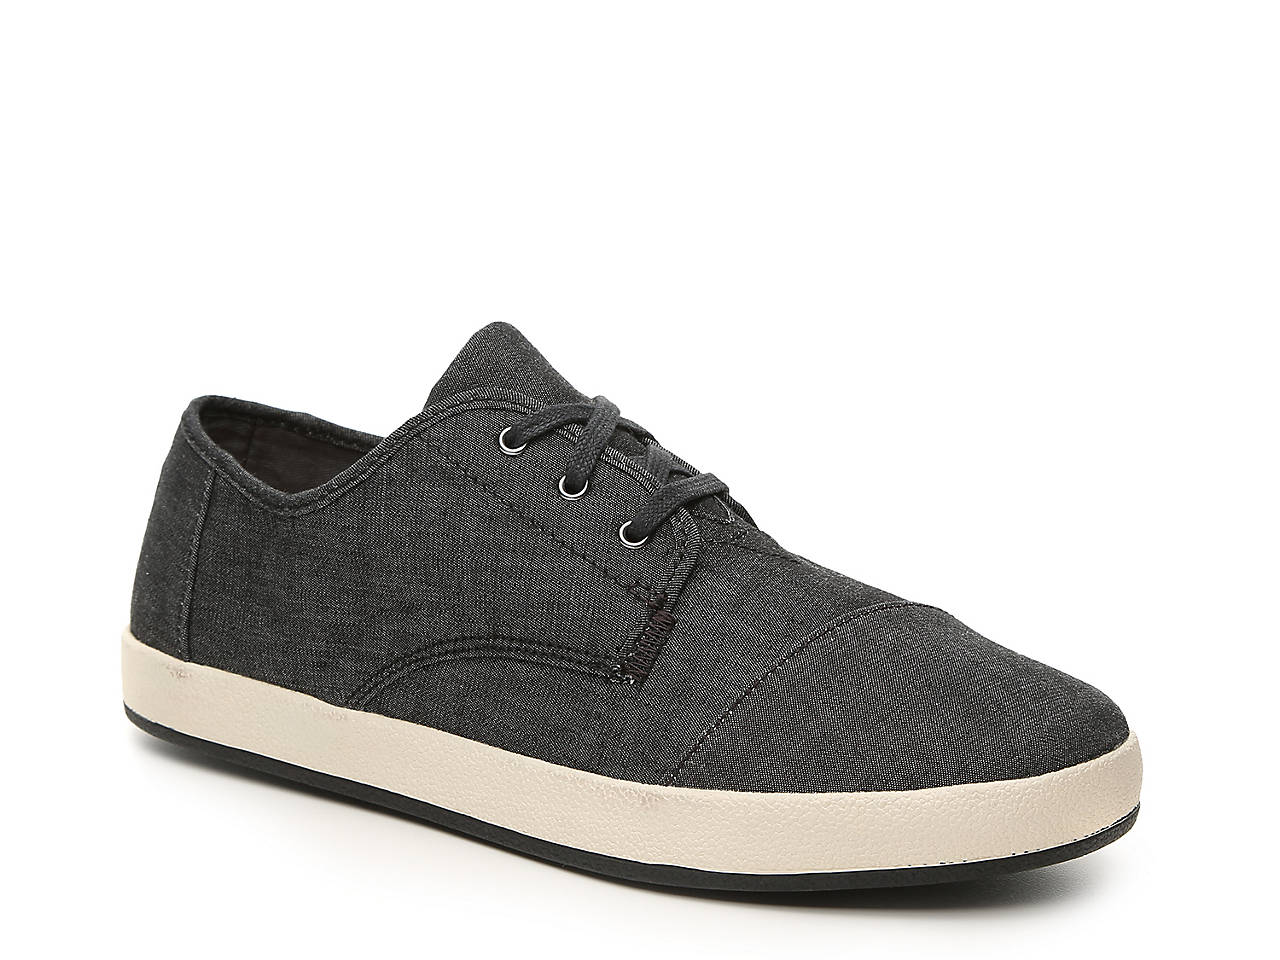 5089d127b9f TOMS Paseo Sneaker Men s Shoes